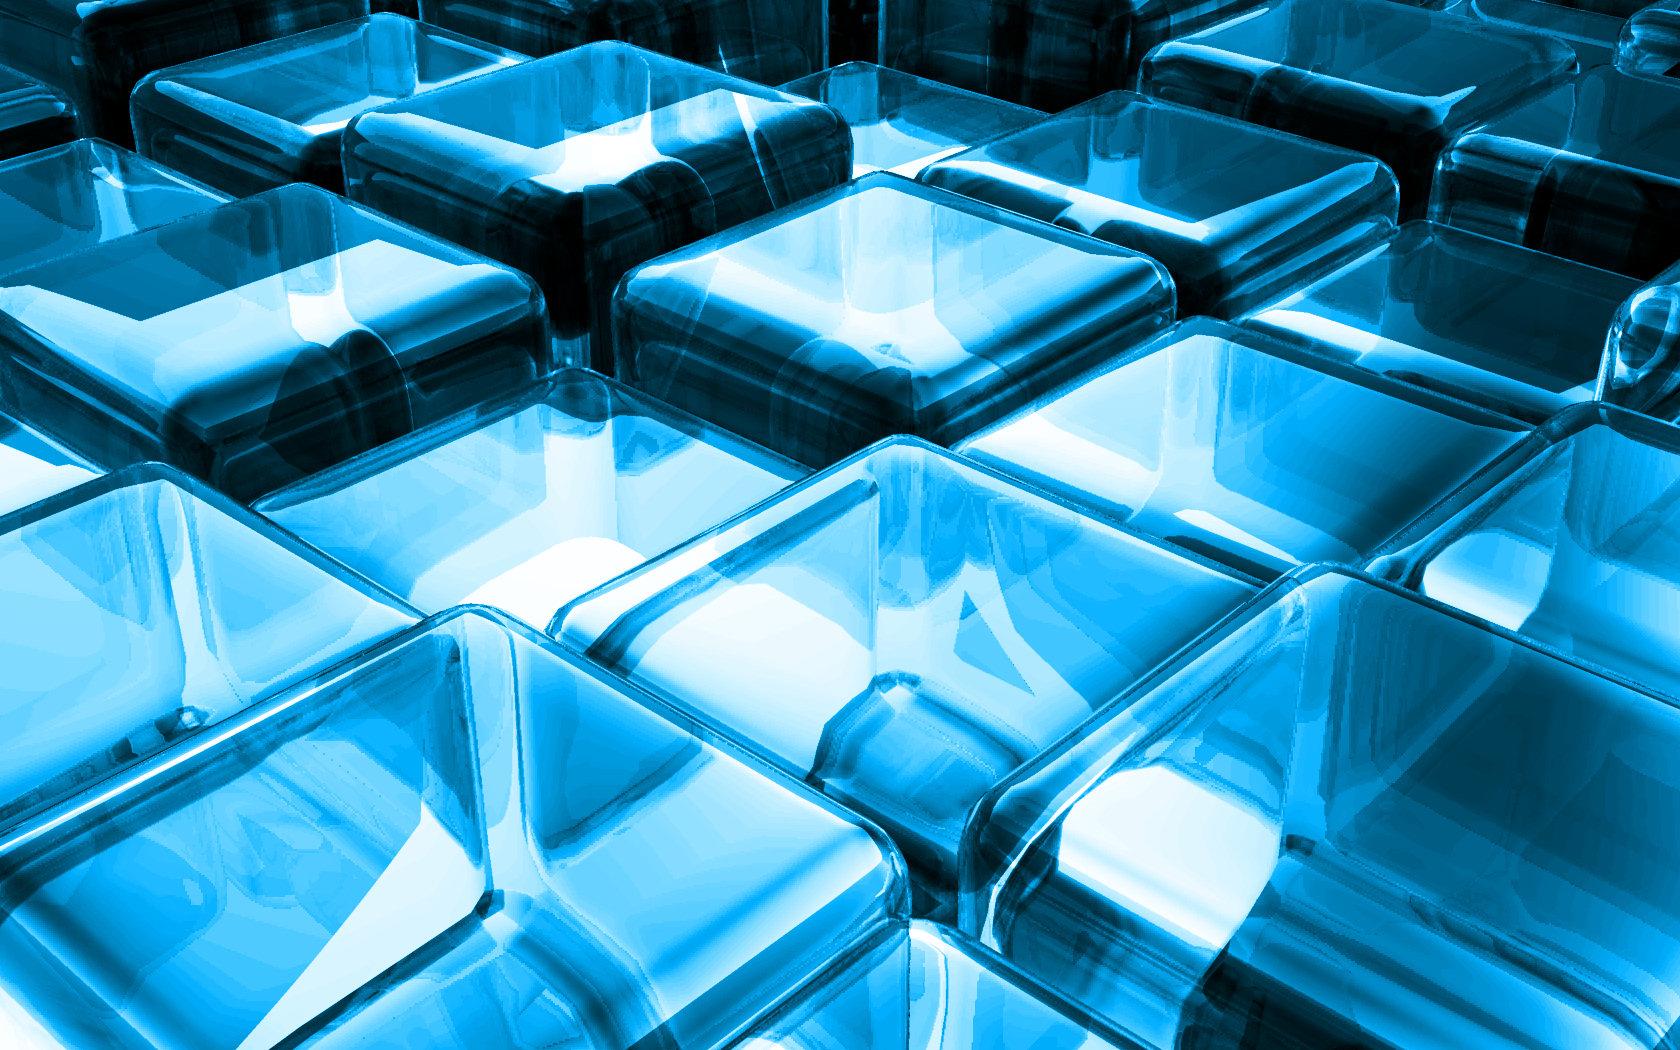 Amazing Transparent Cubes Pictures & Backgrounds